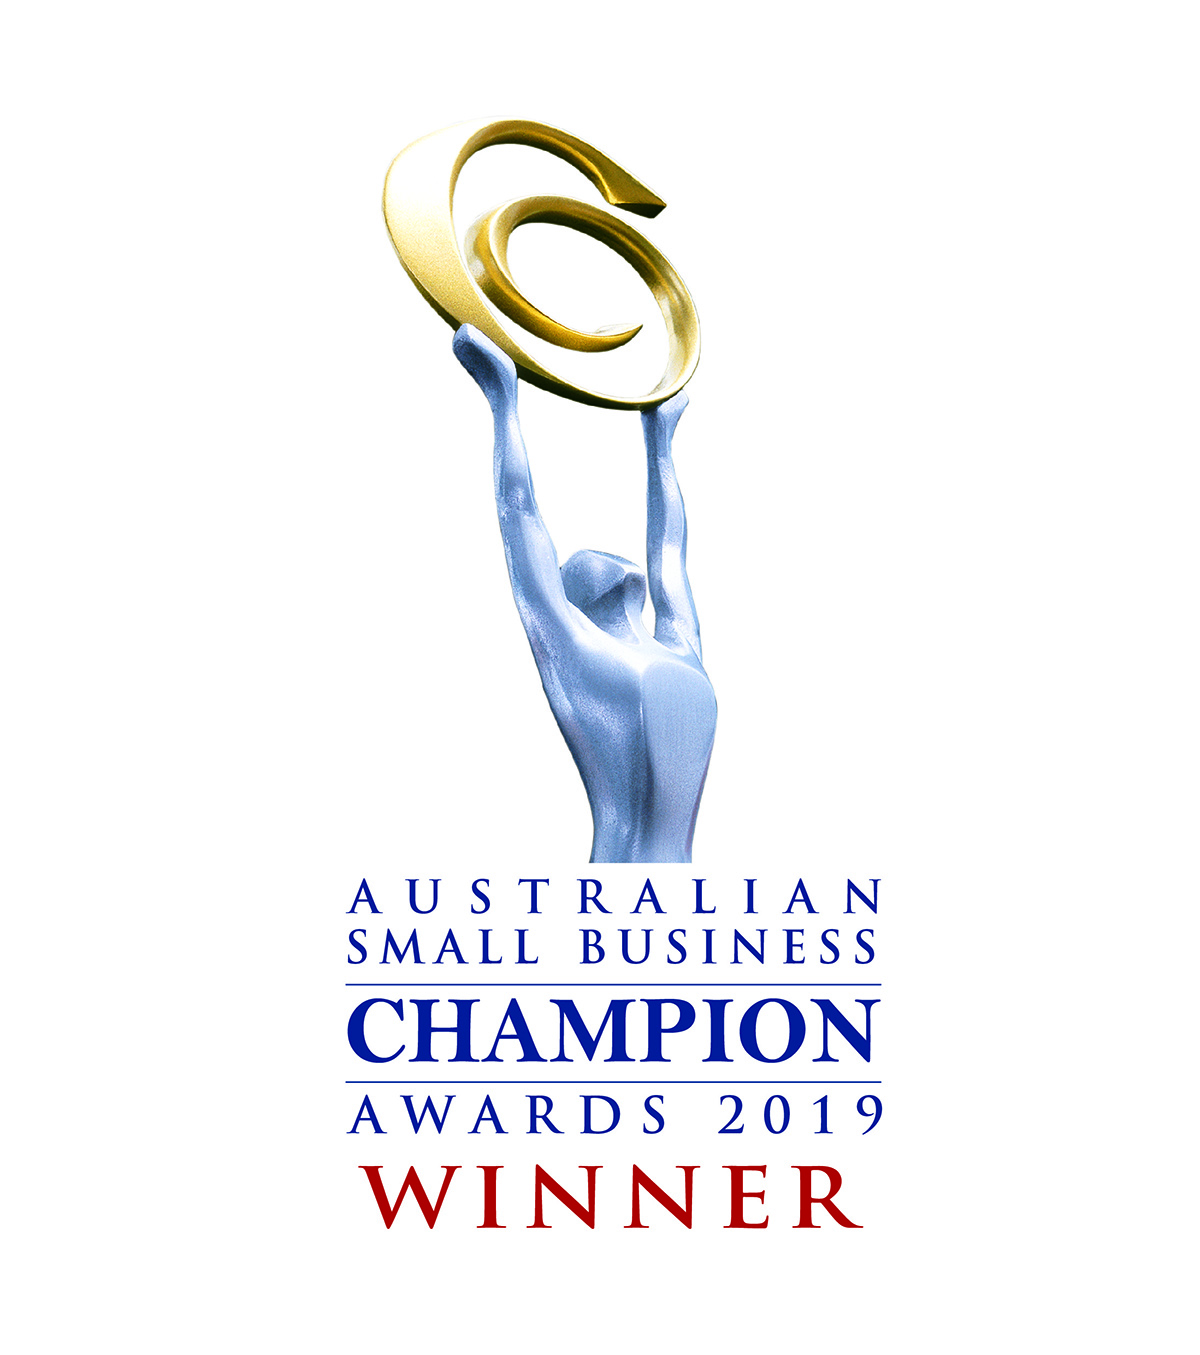 Kingthing Marketing - small business champion awards winner 2019